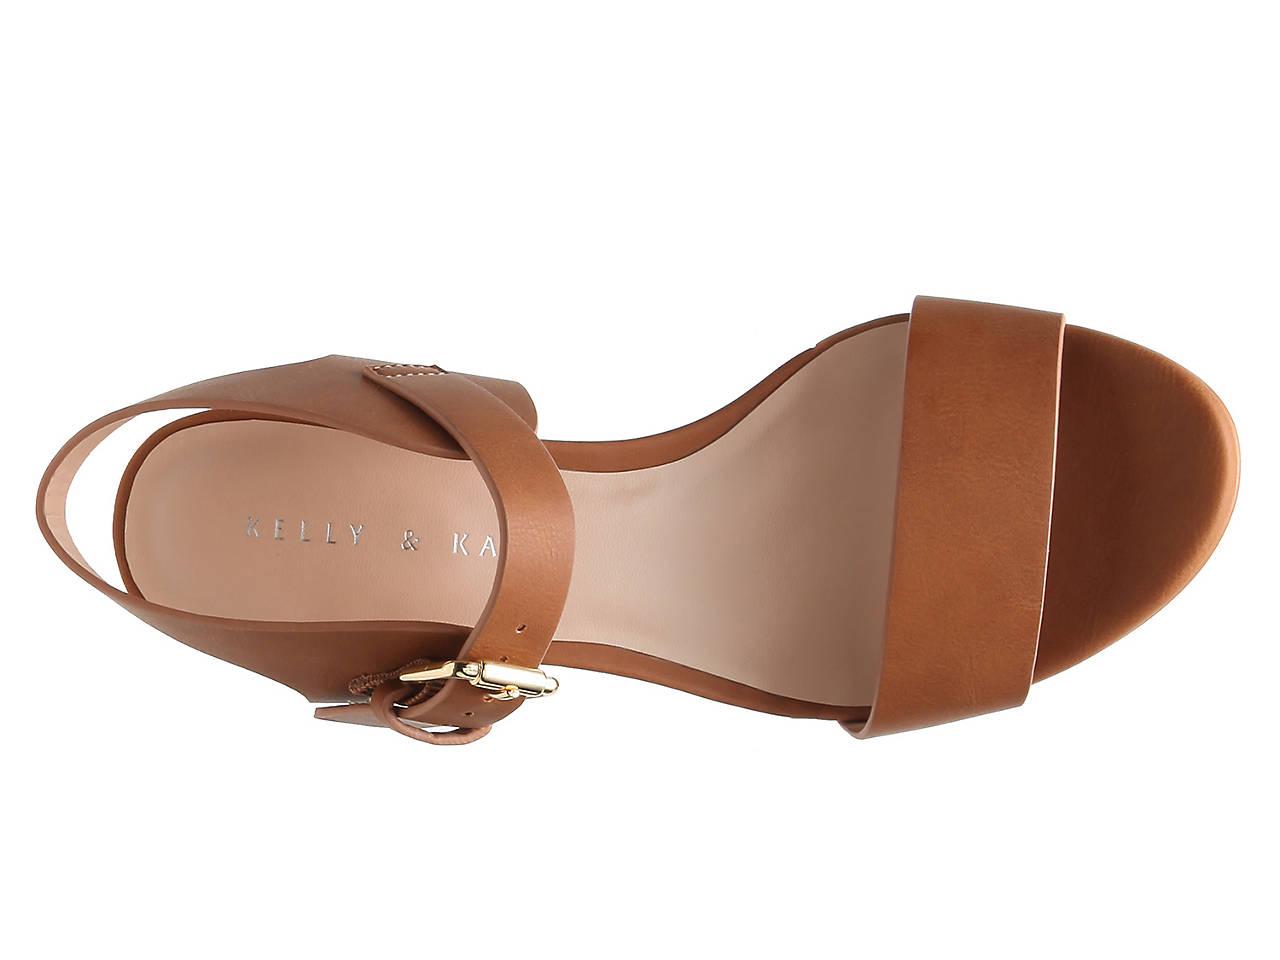 71f89b18b80fd Kelly   Katie Frilisa Sandal Women s Shoes